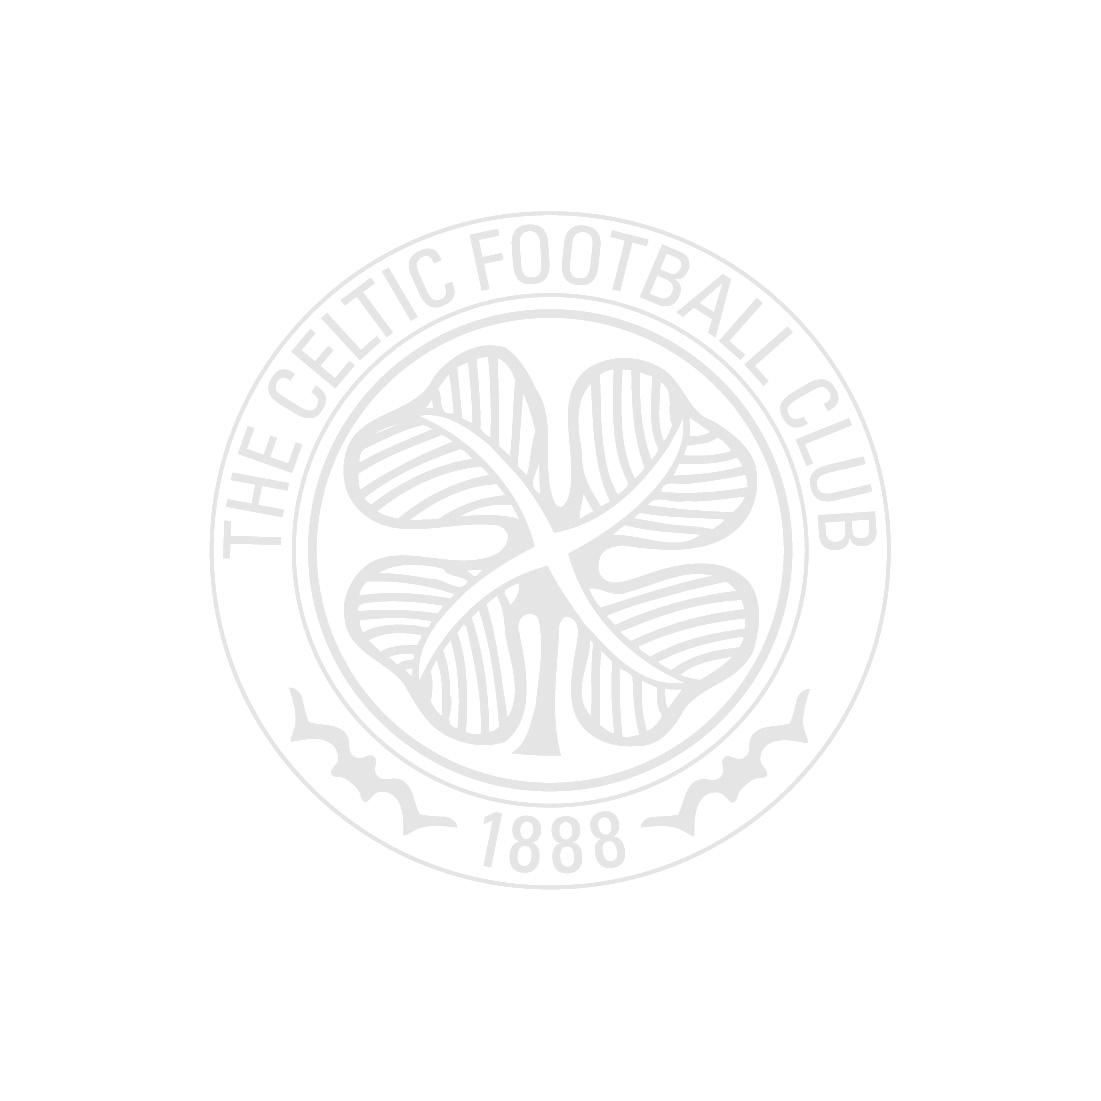 Celtic Pom Pom Headcover